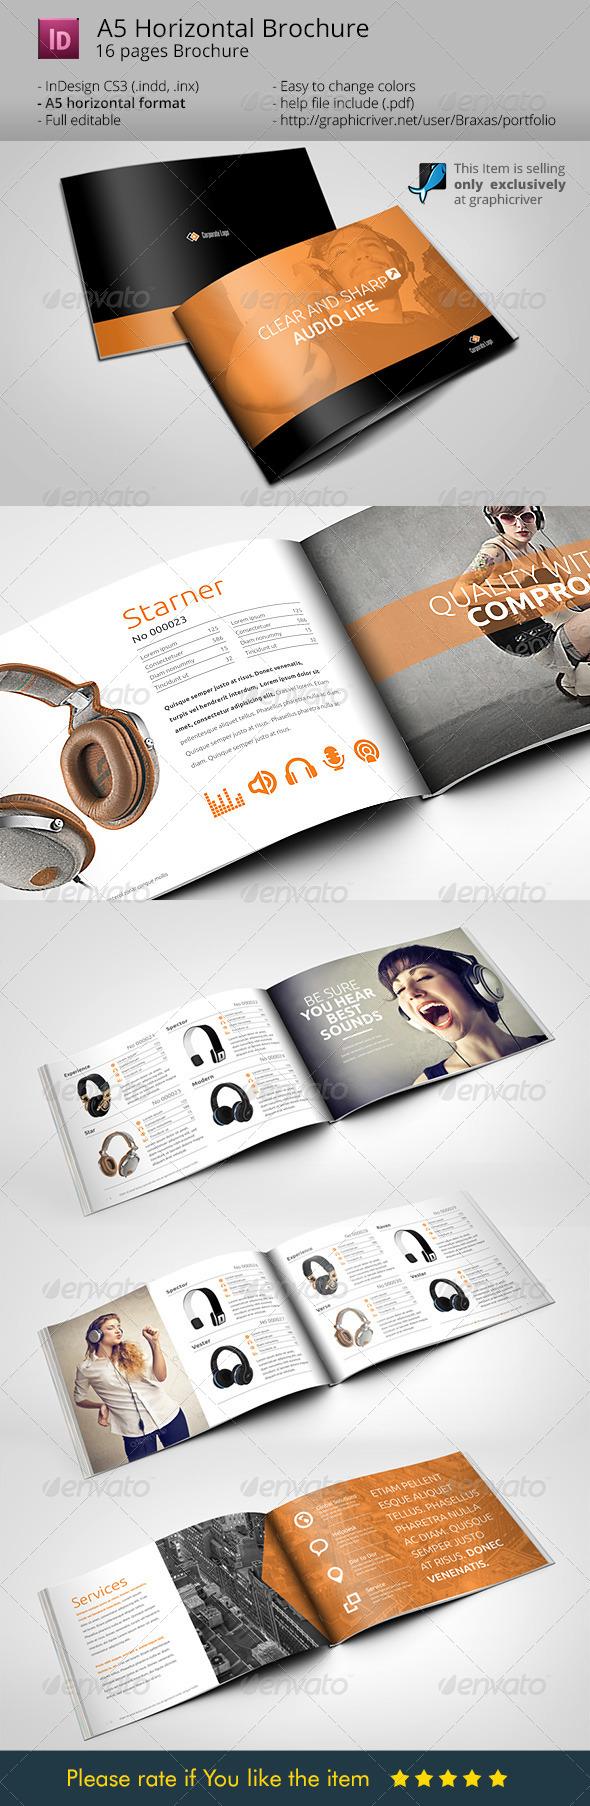 Horizontal brochure a5 audio life graphicriver for Horizontal brochure design